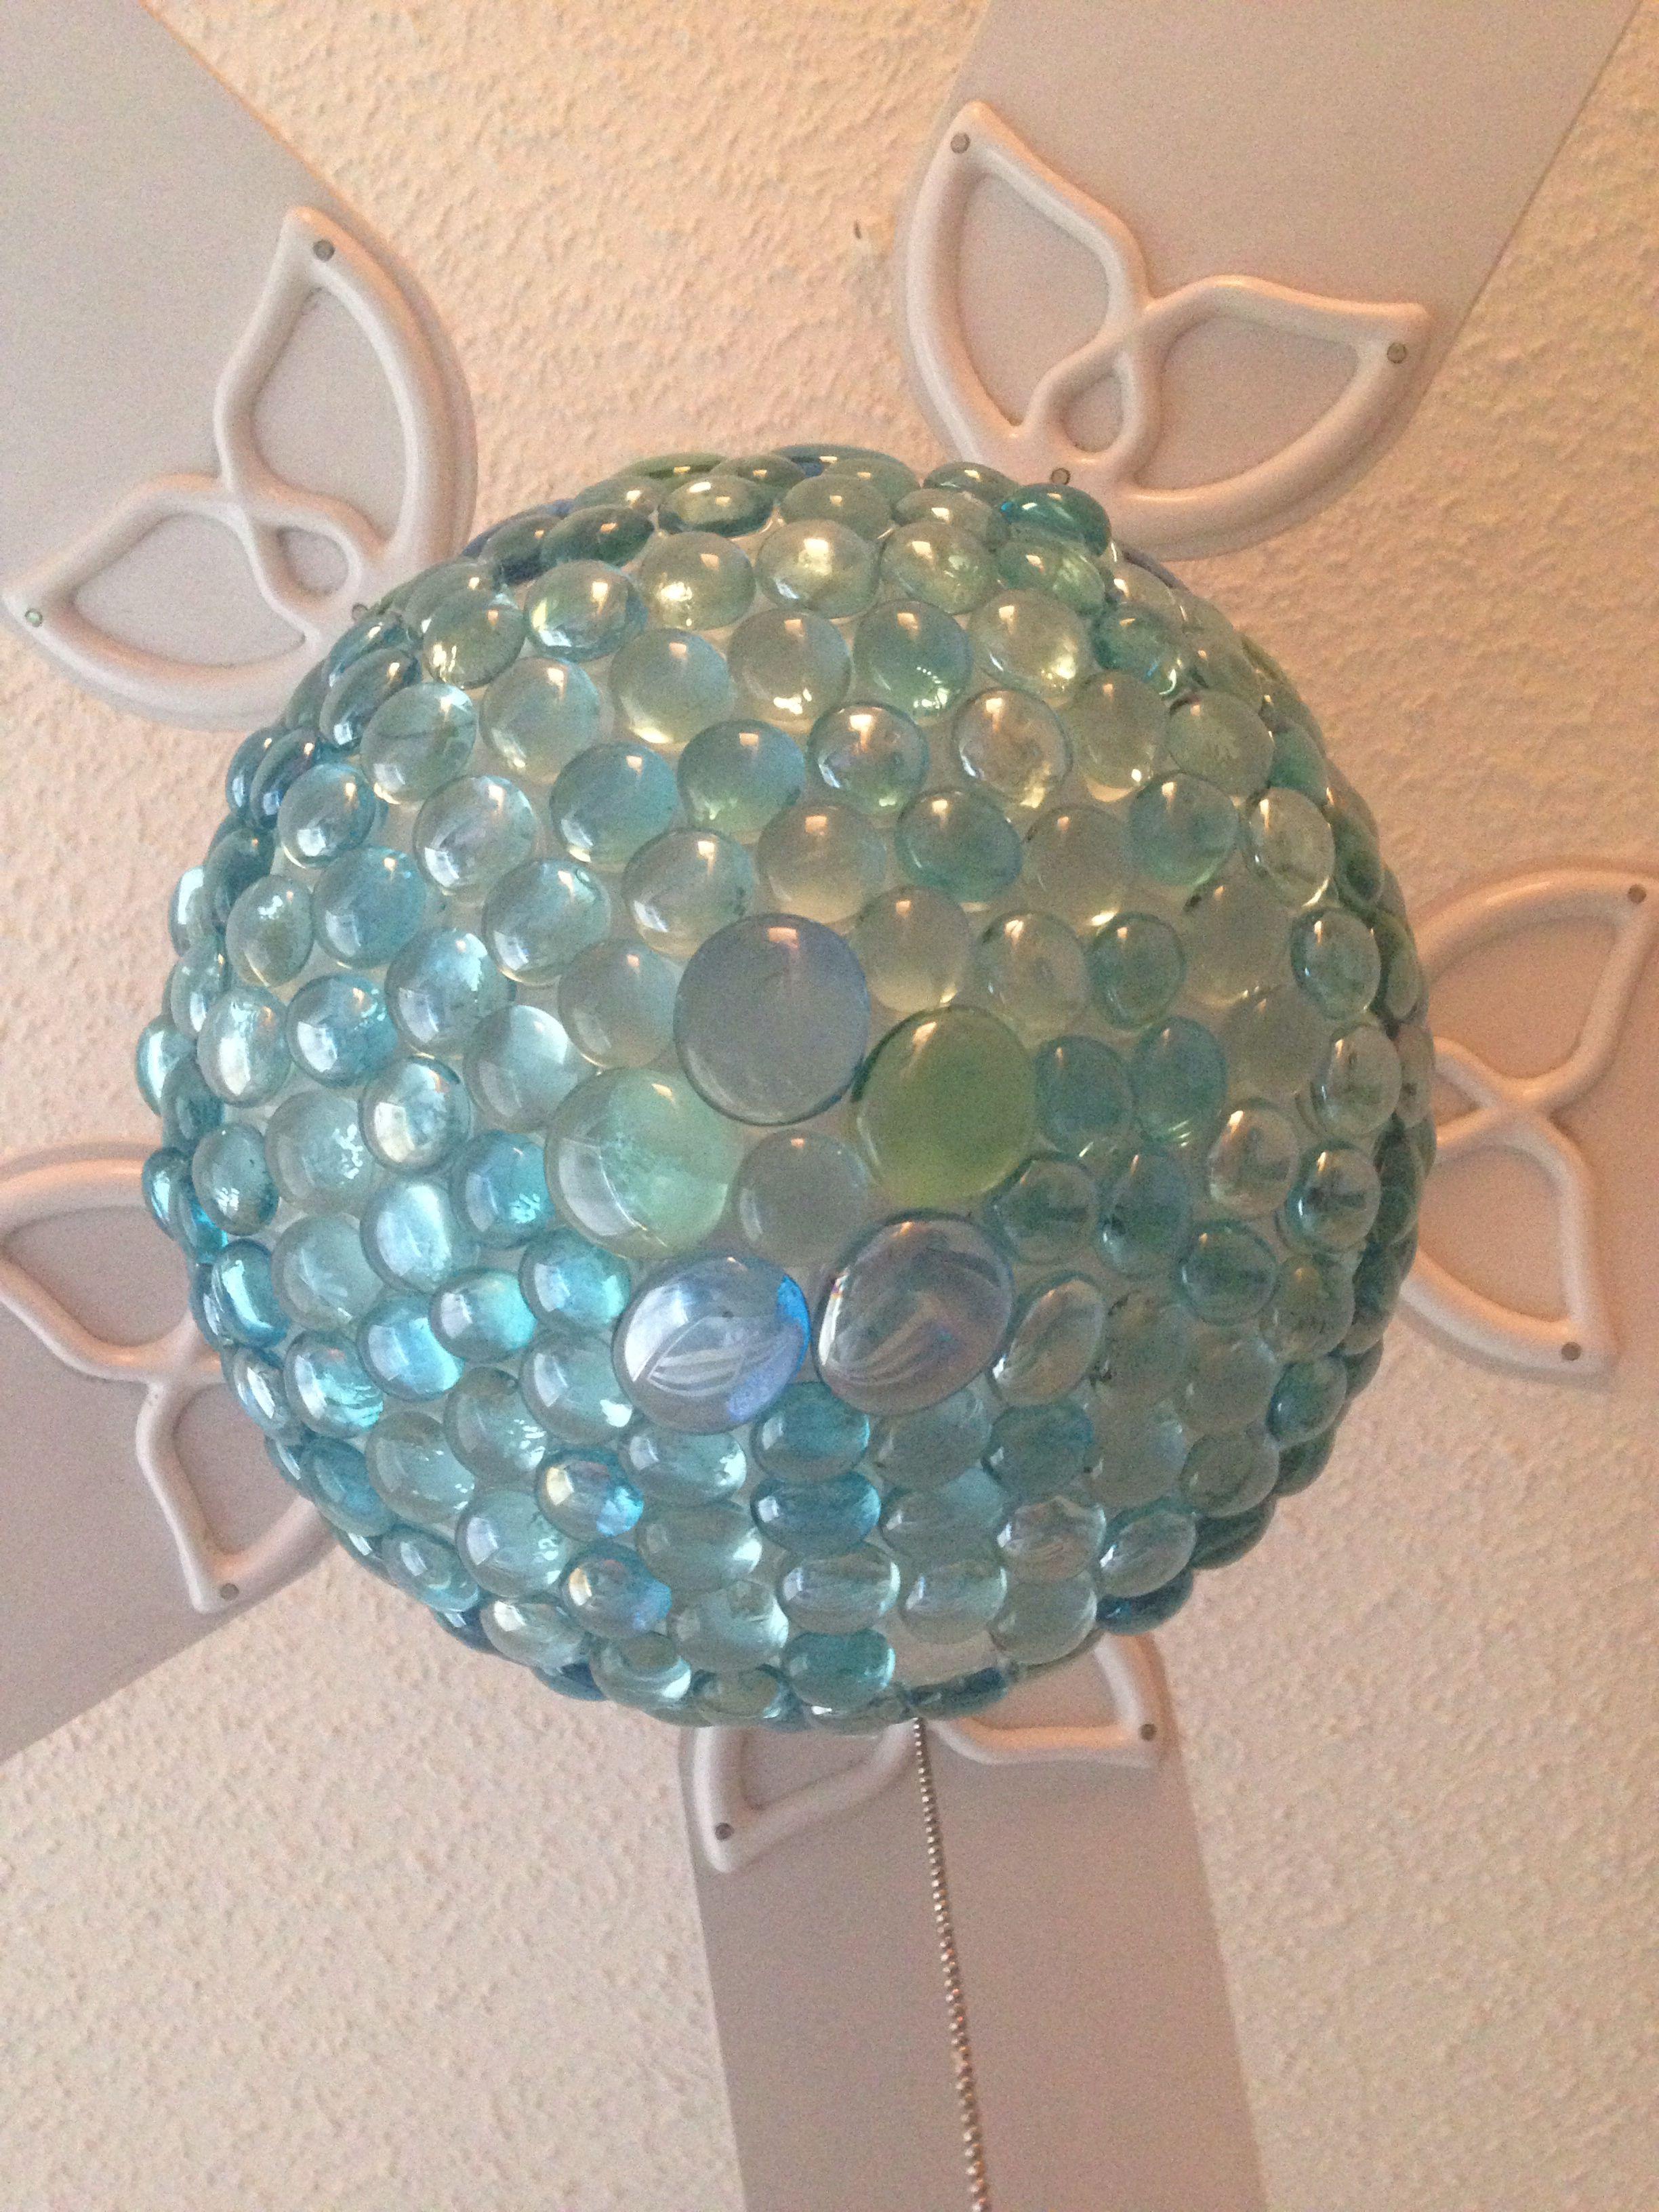 Turquoise aqua ceiling fan light globe AFTER DIY